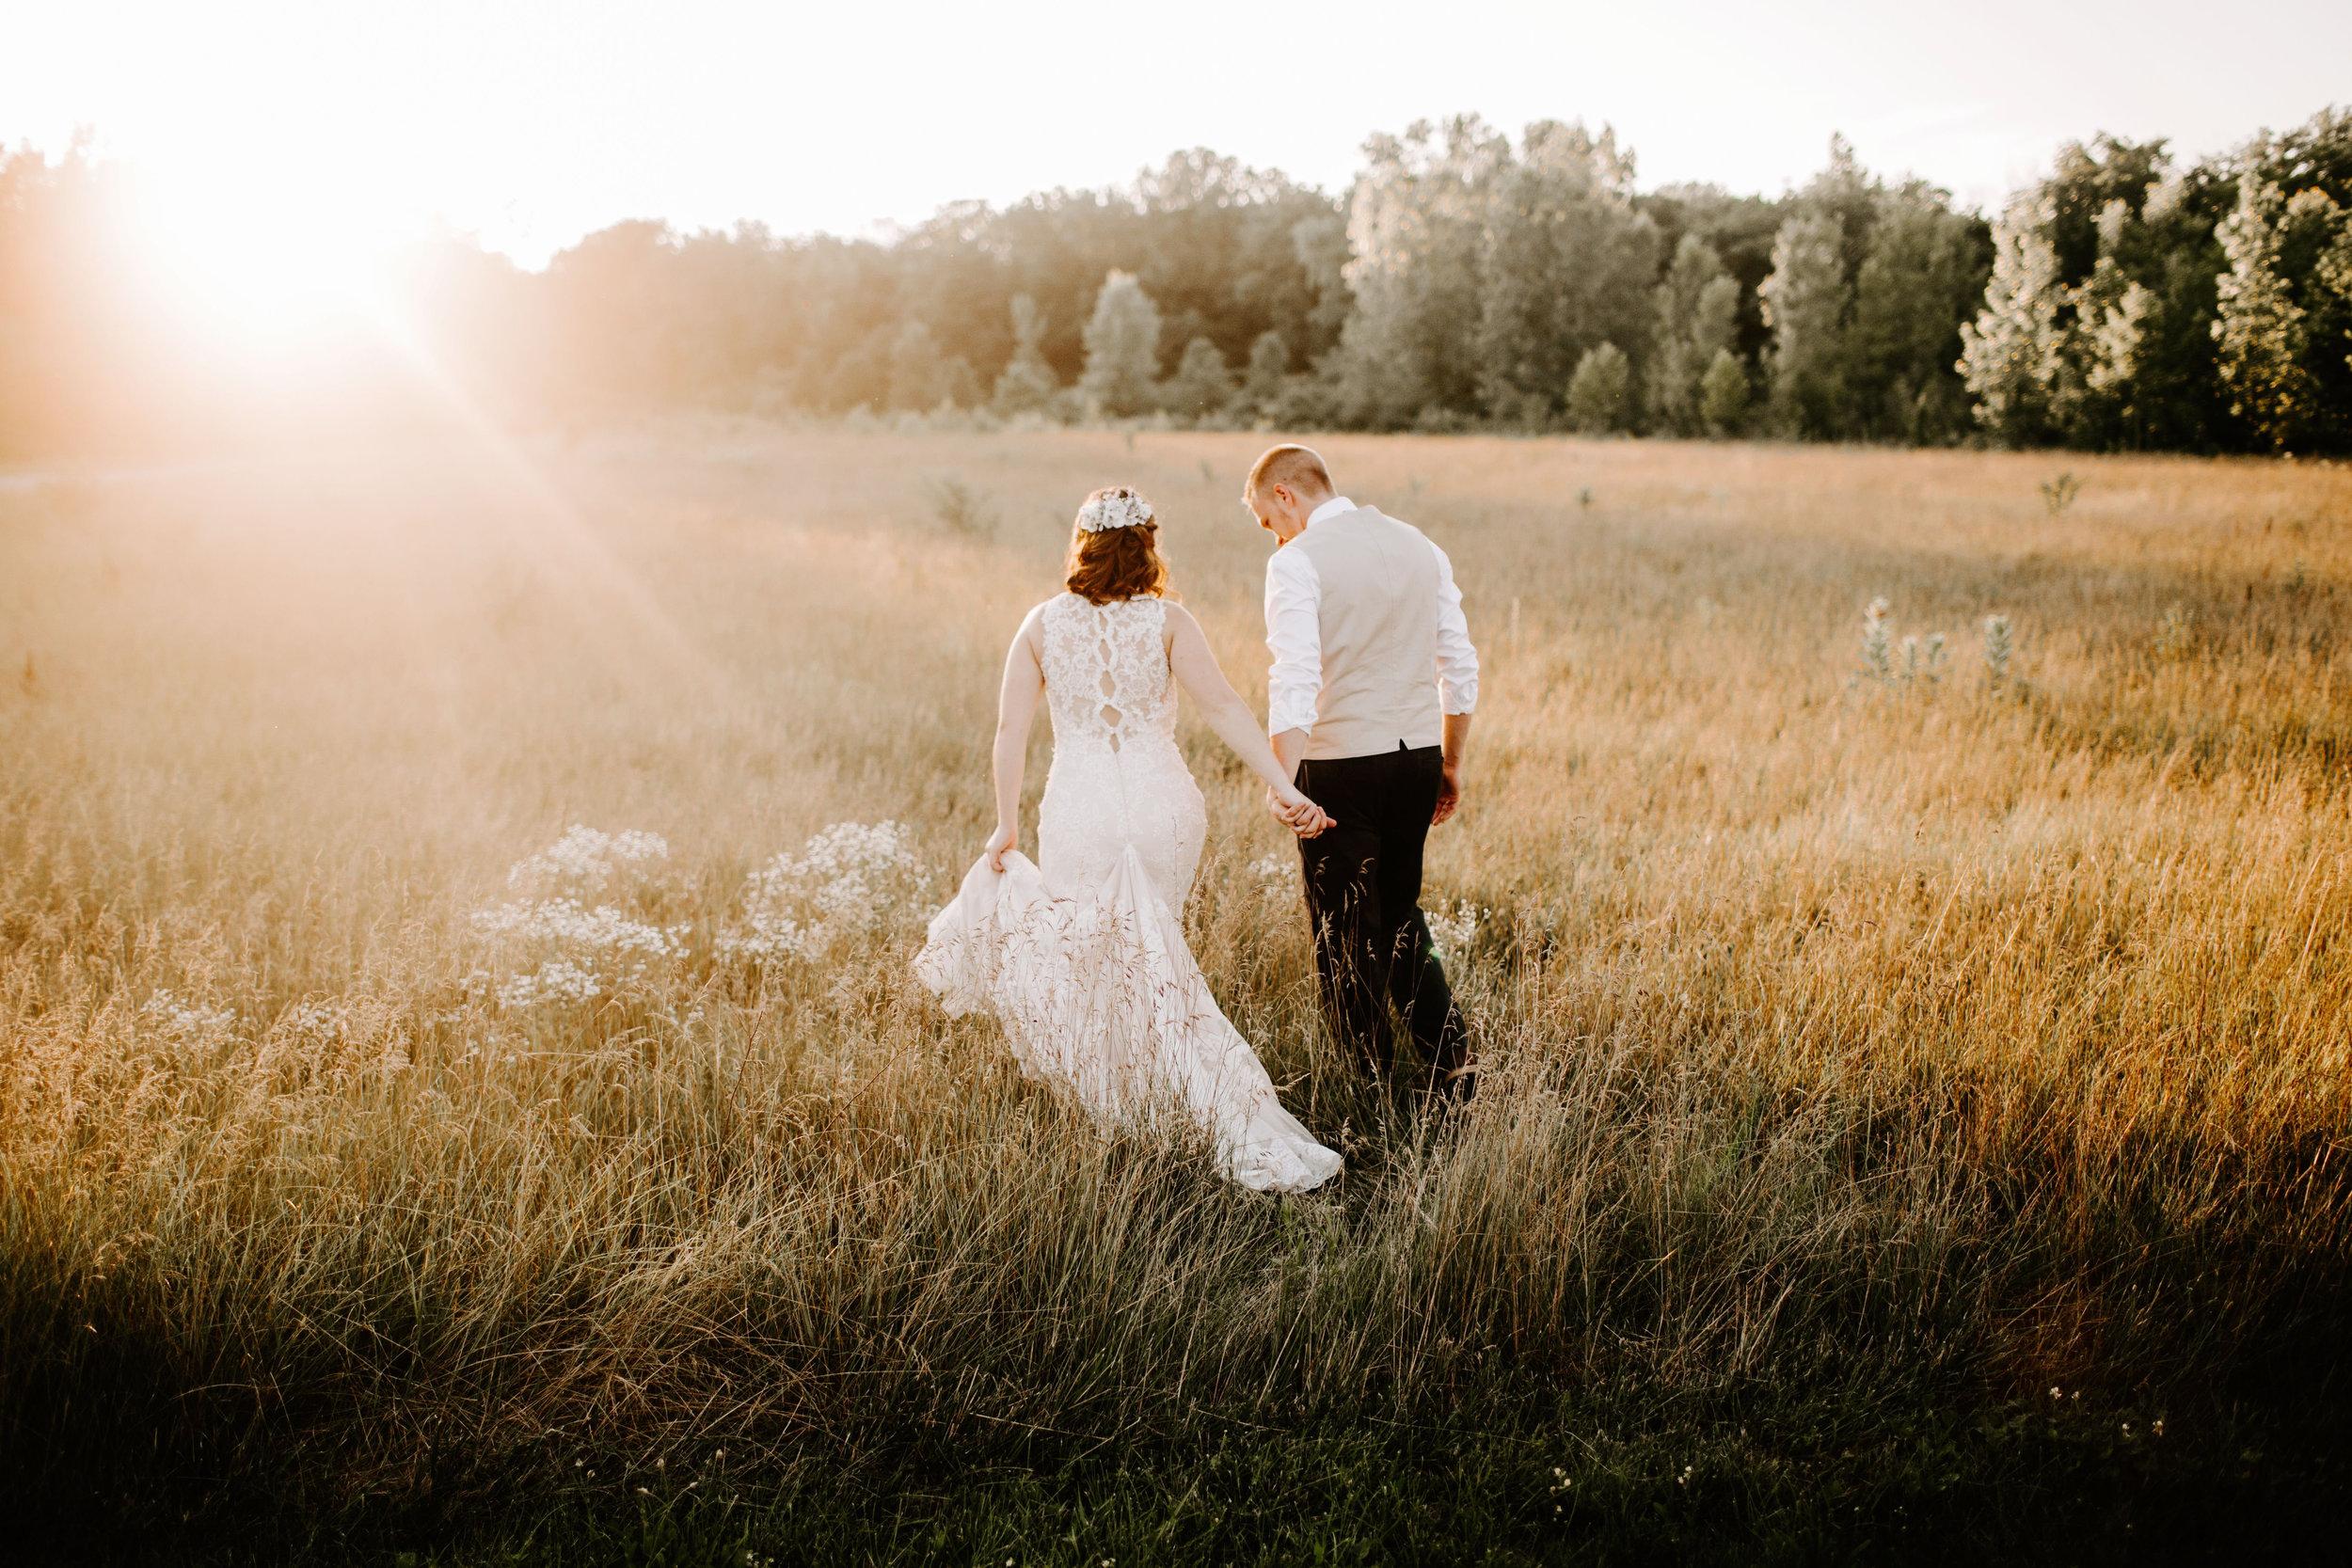 Payton_and_Austin_Avon_Indiana_Wedding_Emliy_Elyse_Wehner_Photogrpahy-838.jpg